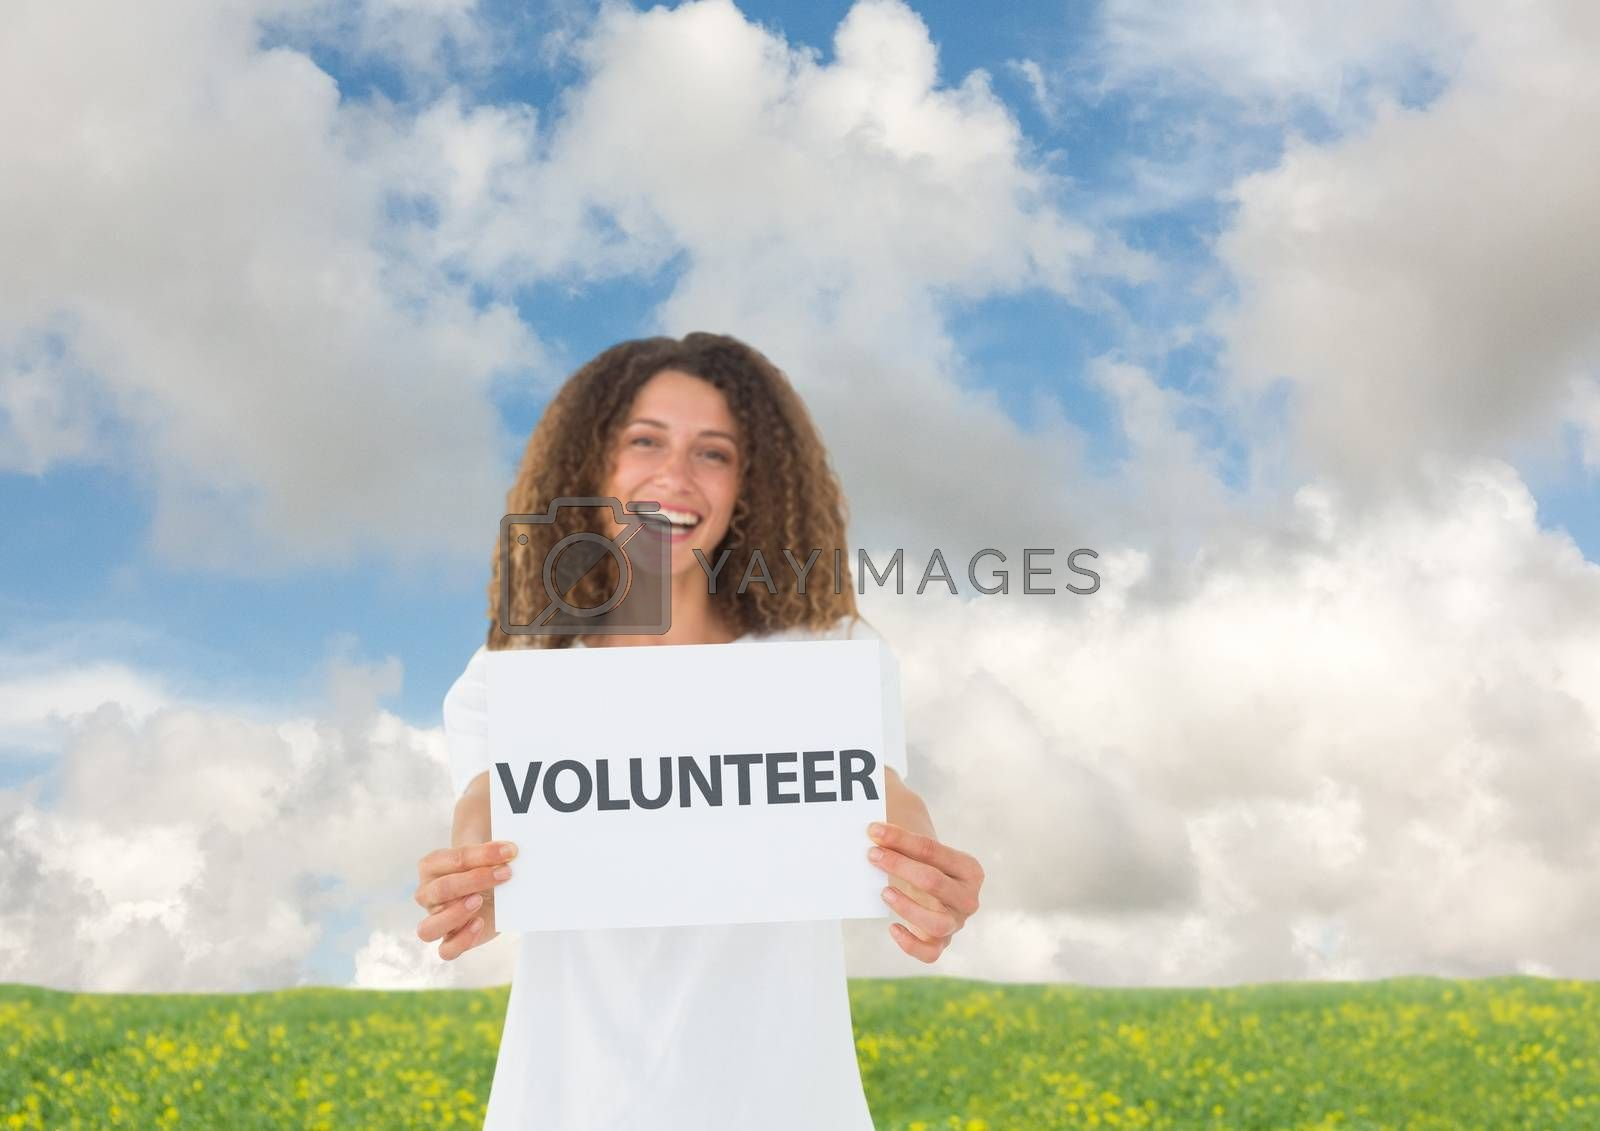 Digital Composite of Smiling volunteer holding whitecard against field background